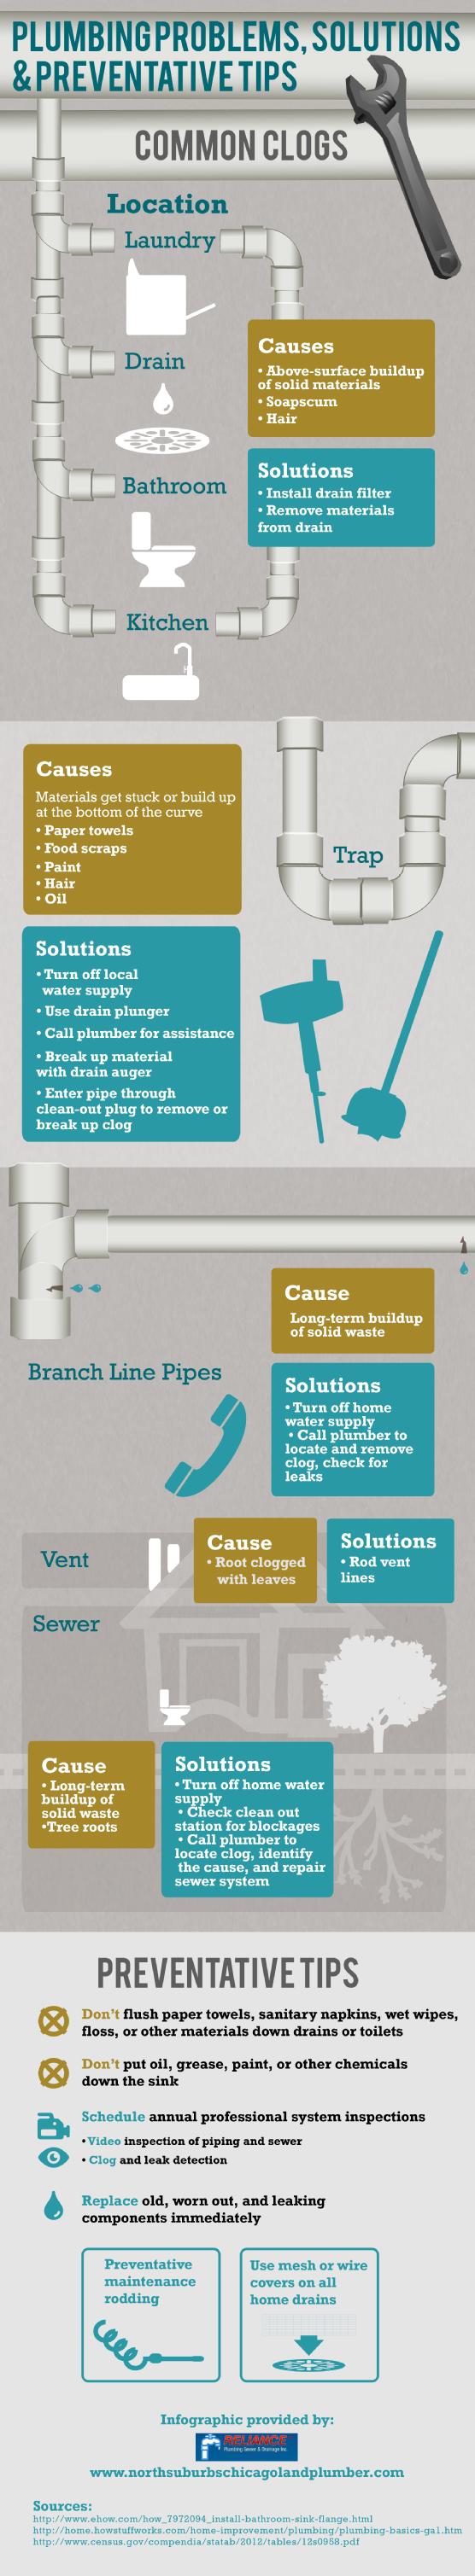 of 125 Good Plumbing Company Names Plumbing Causes and Preventative Maintenance Plumbing Causes and Preventative Maintenance